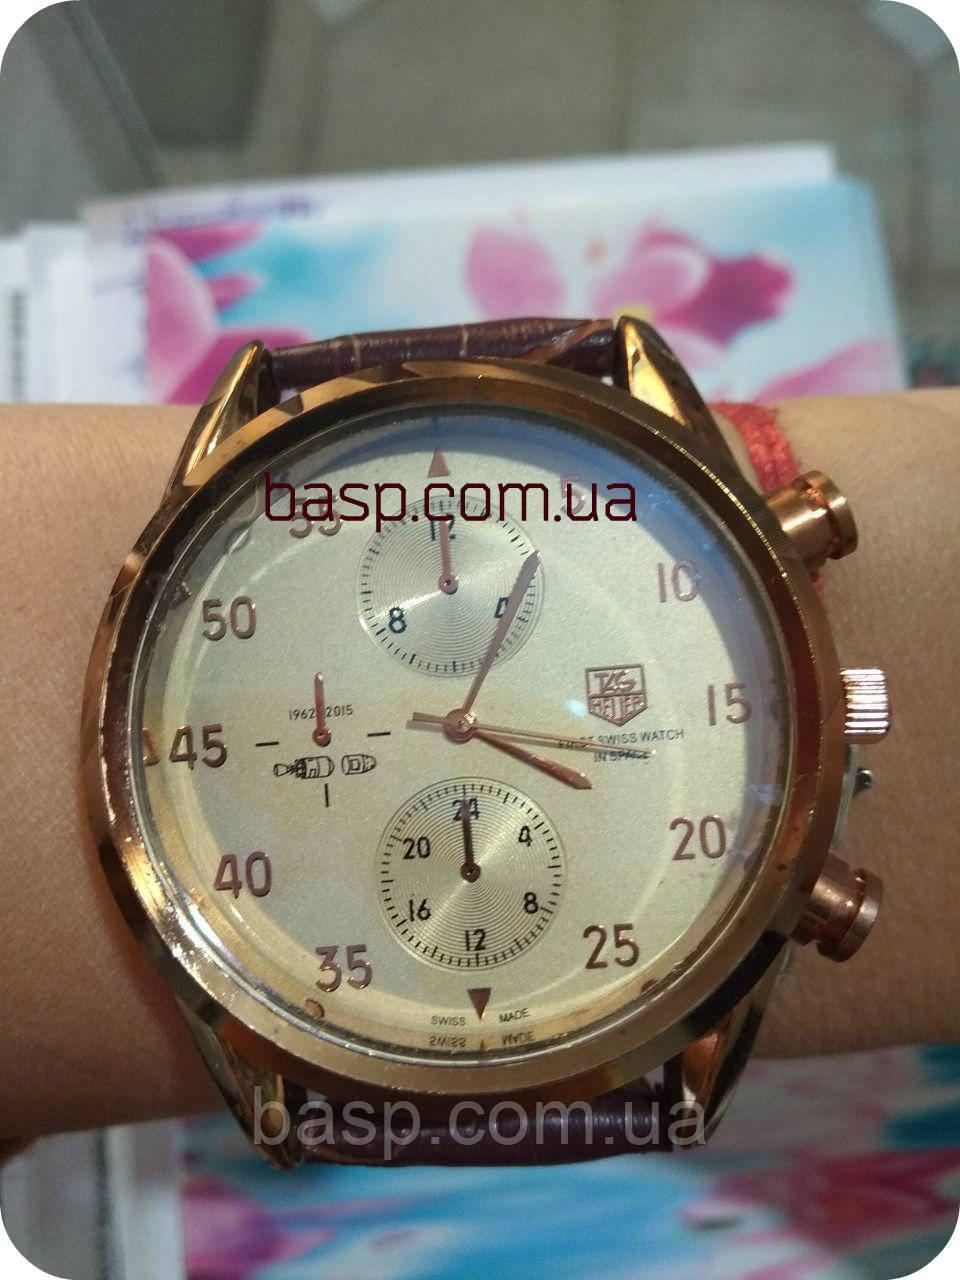 Часы tag heuer spacex цена жизни